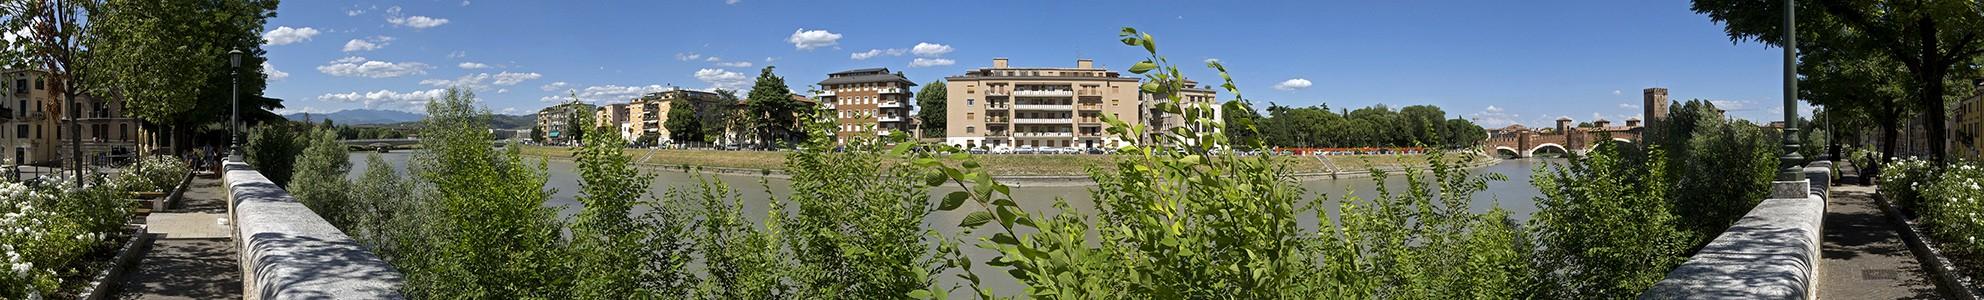 Etsch (Adige), Ponte Scaligero (Skaligerbrücke), Castelvecchio Verona